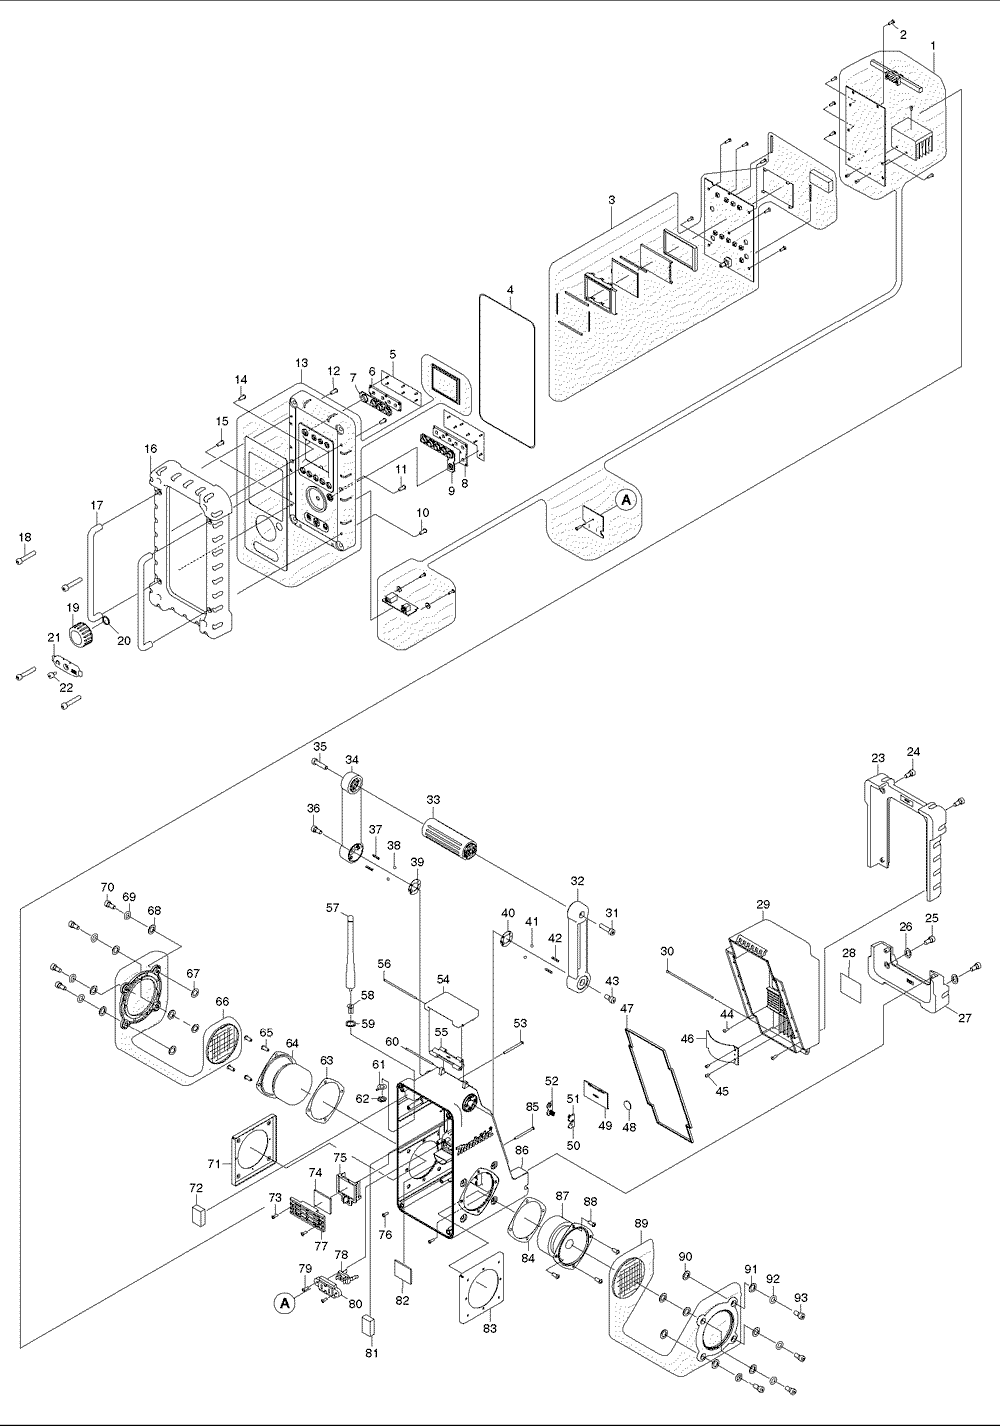 rc_6291] makita switch wiring diagram makita blower wiring diagram 3 speed fan switch wiring diagram aspi anist ricis lious elec mohammedshrine librar wiring 101